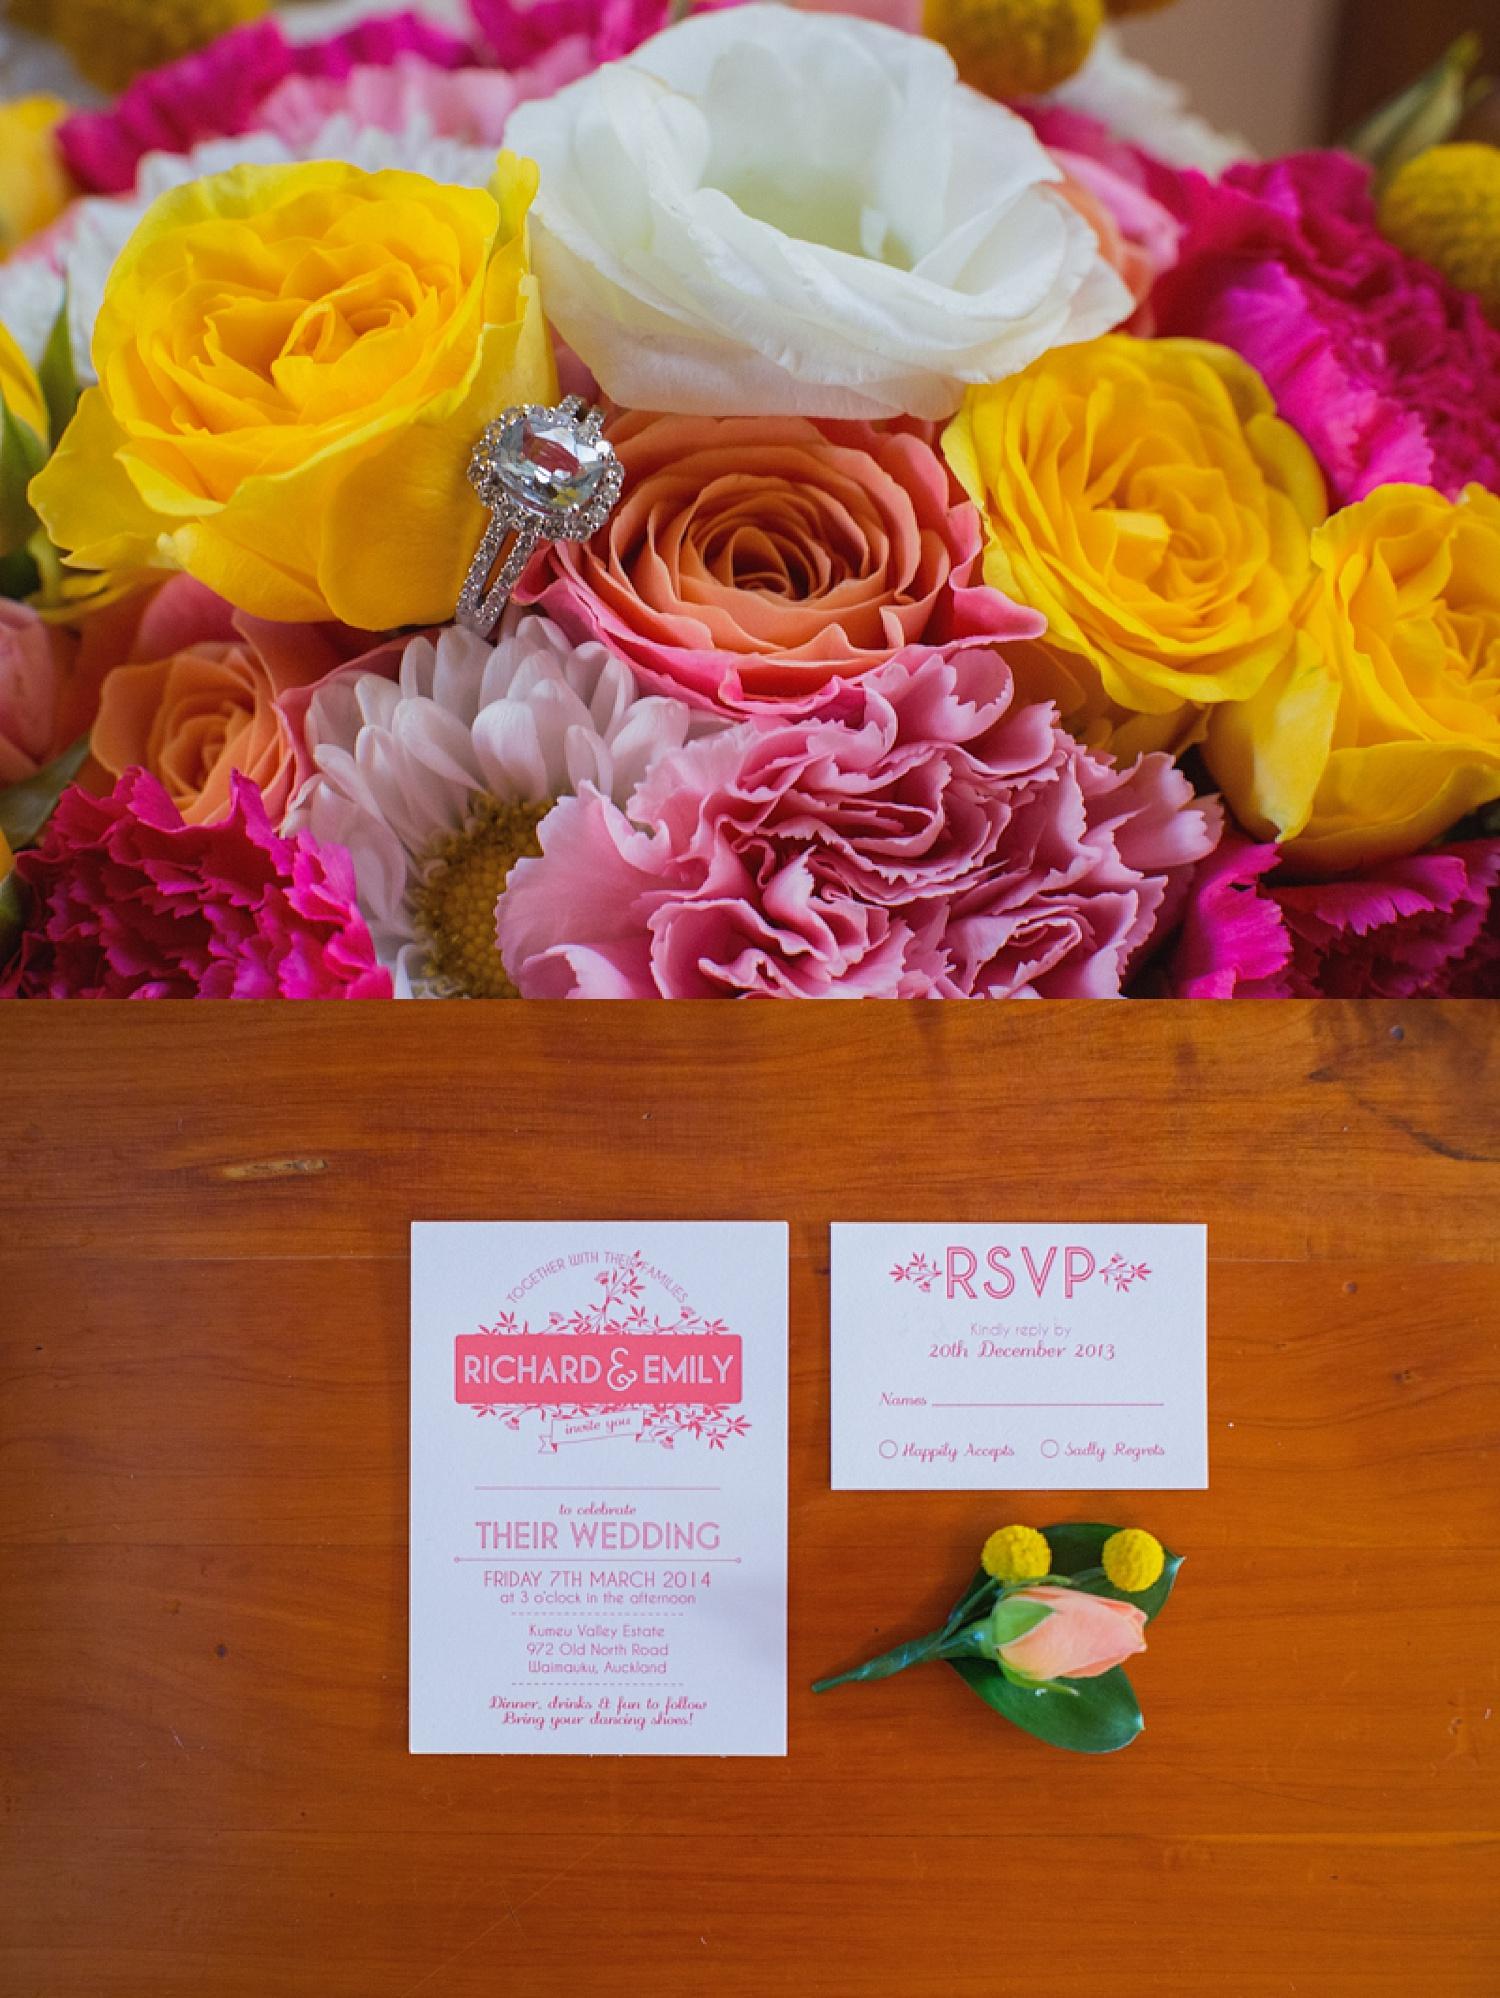 kumeu_valley_estate_wedding_0002.jpg